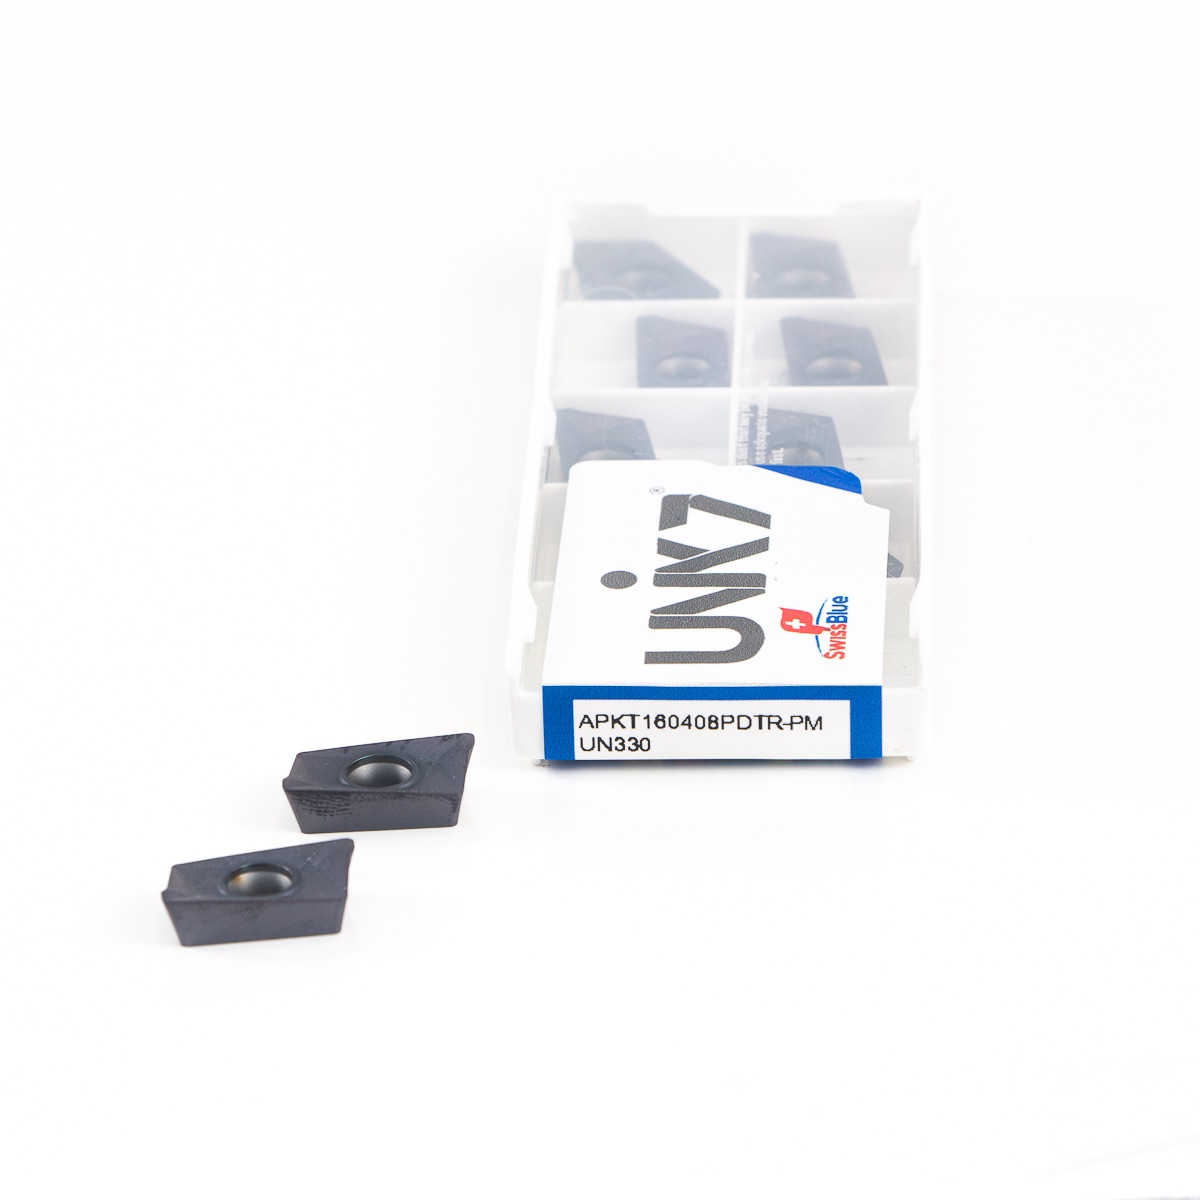 Pastilha de metal duro com revestimento para fresa intercambiável referência Unik7 APKT160408 PDTR PM UN330